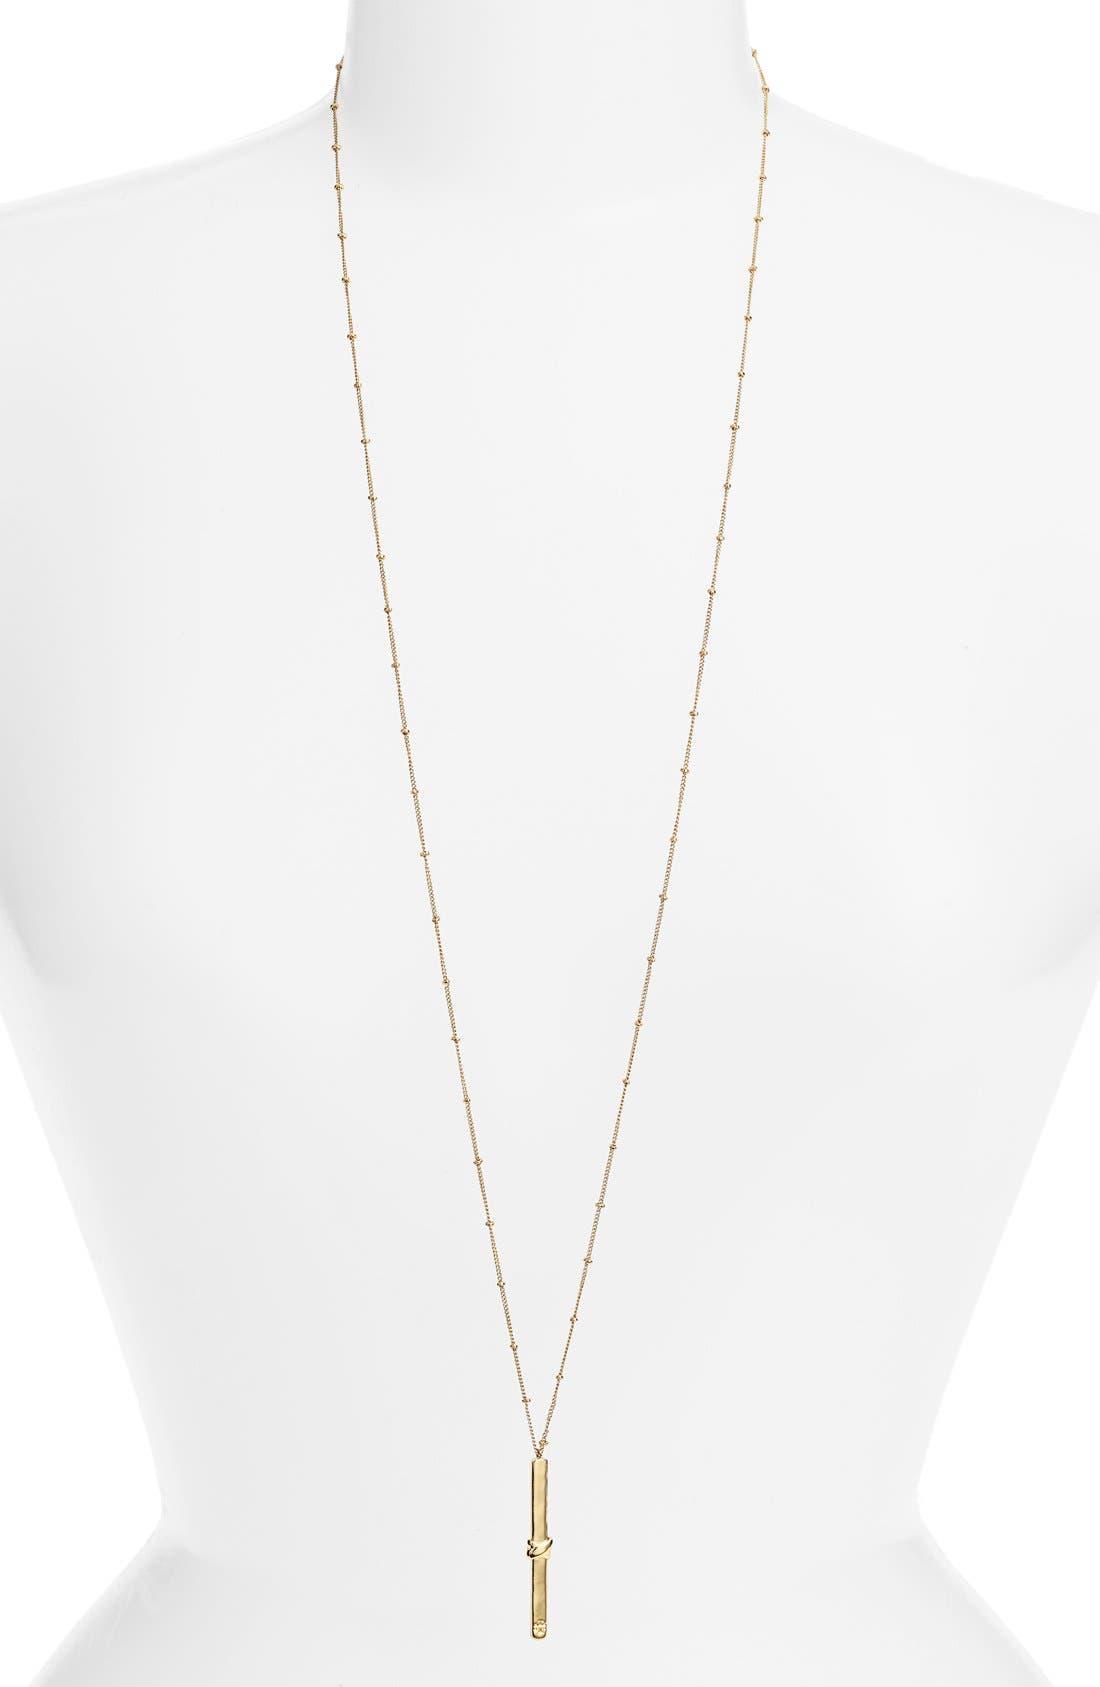 Alternate Image 1 Selected - Tory Burch Wrap Bar Pendant Necklace